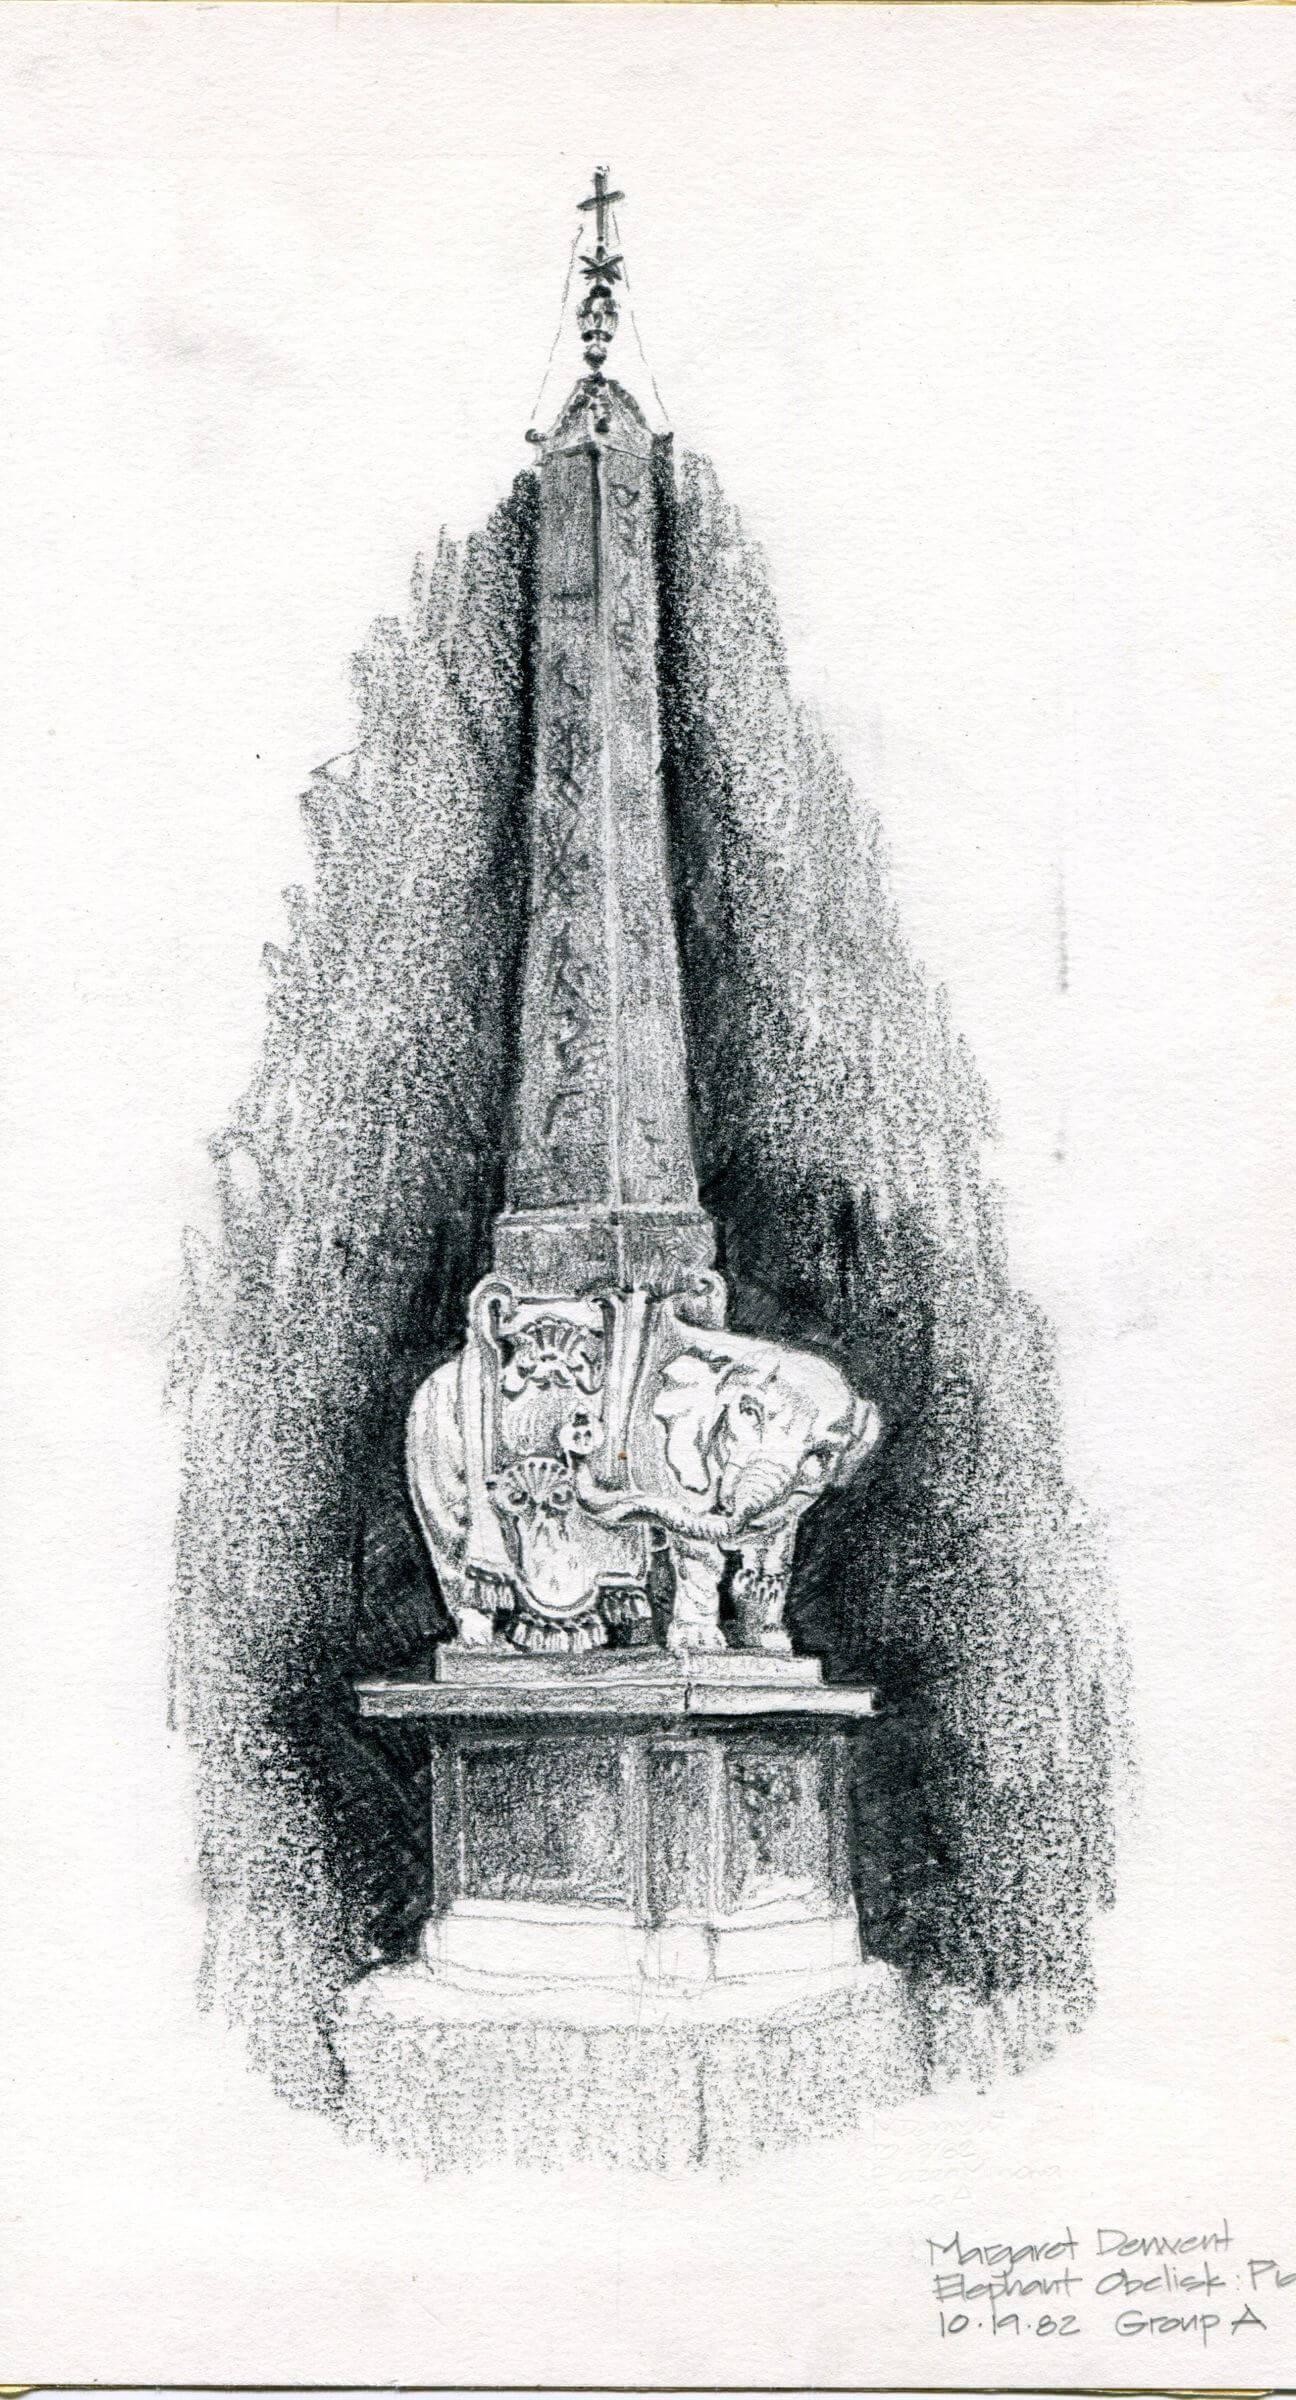 1982 Elephant Obelisk001